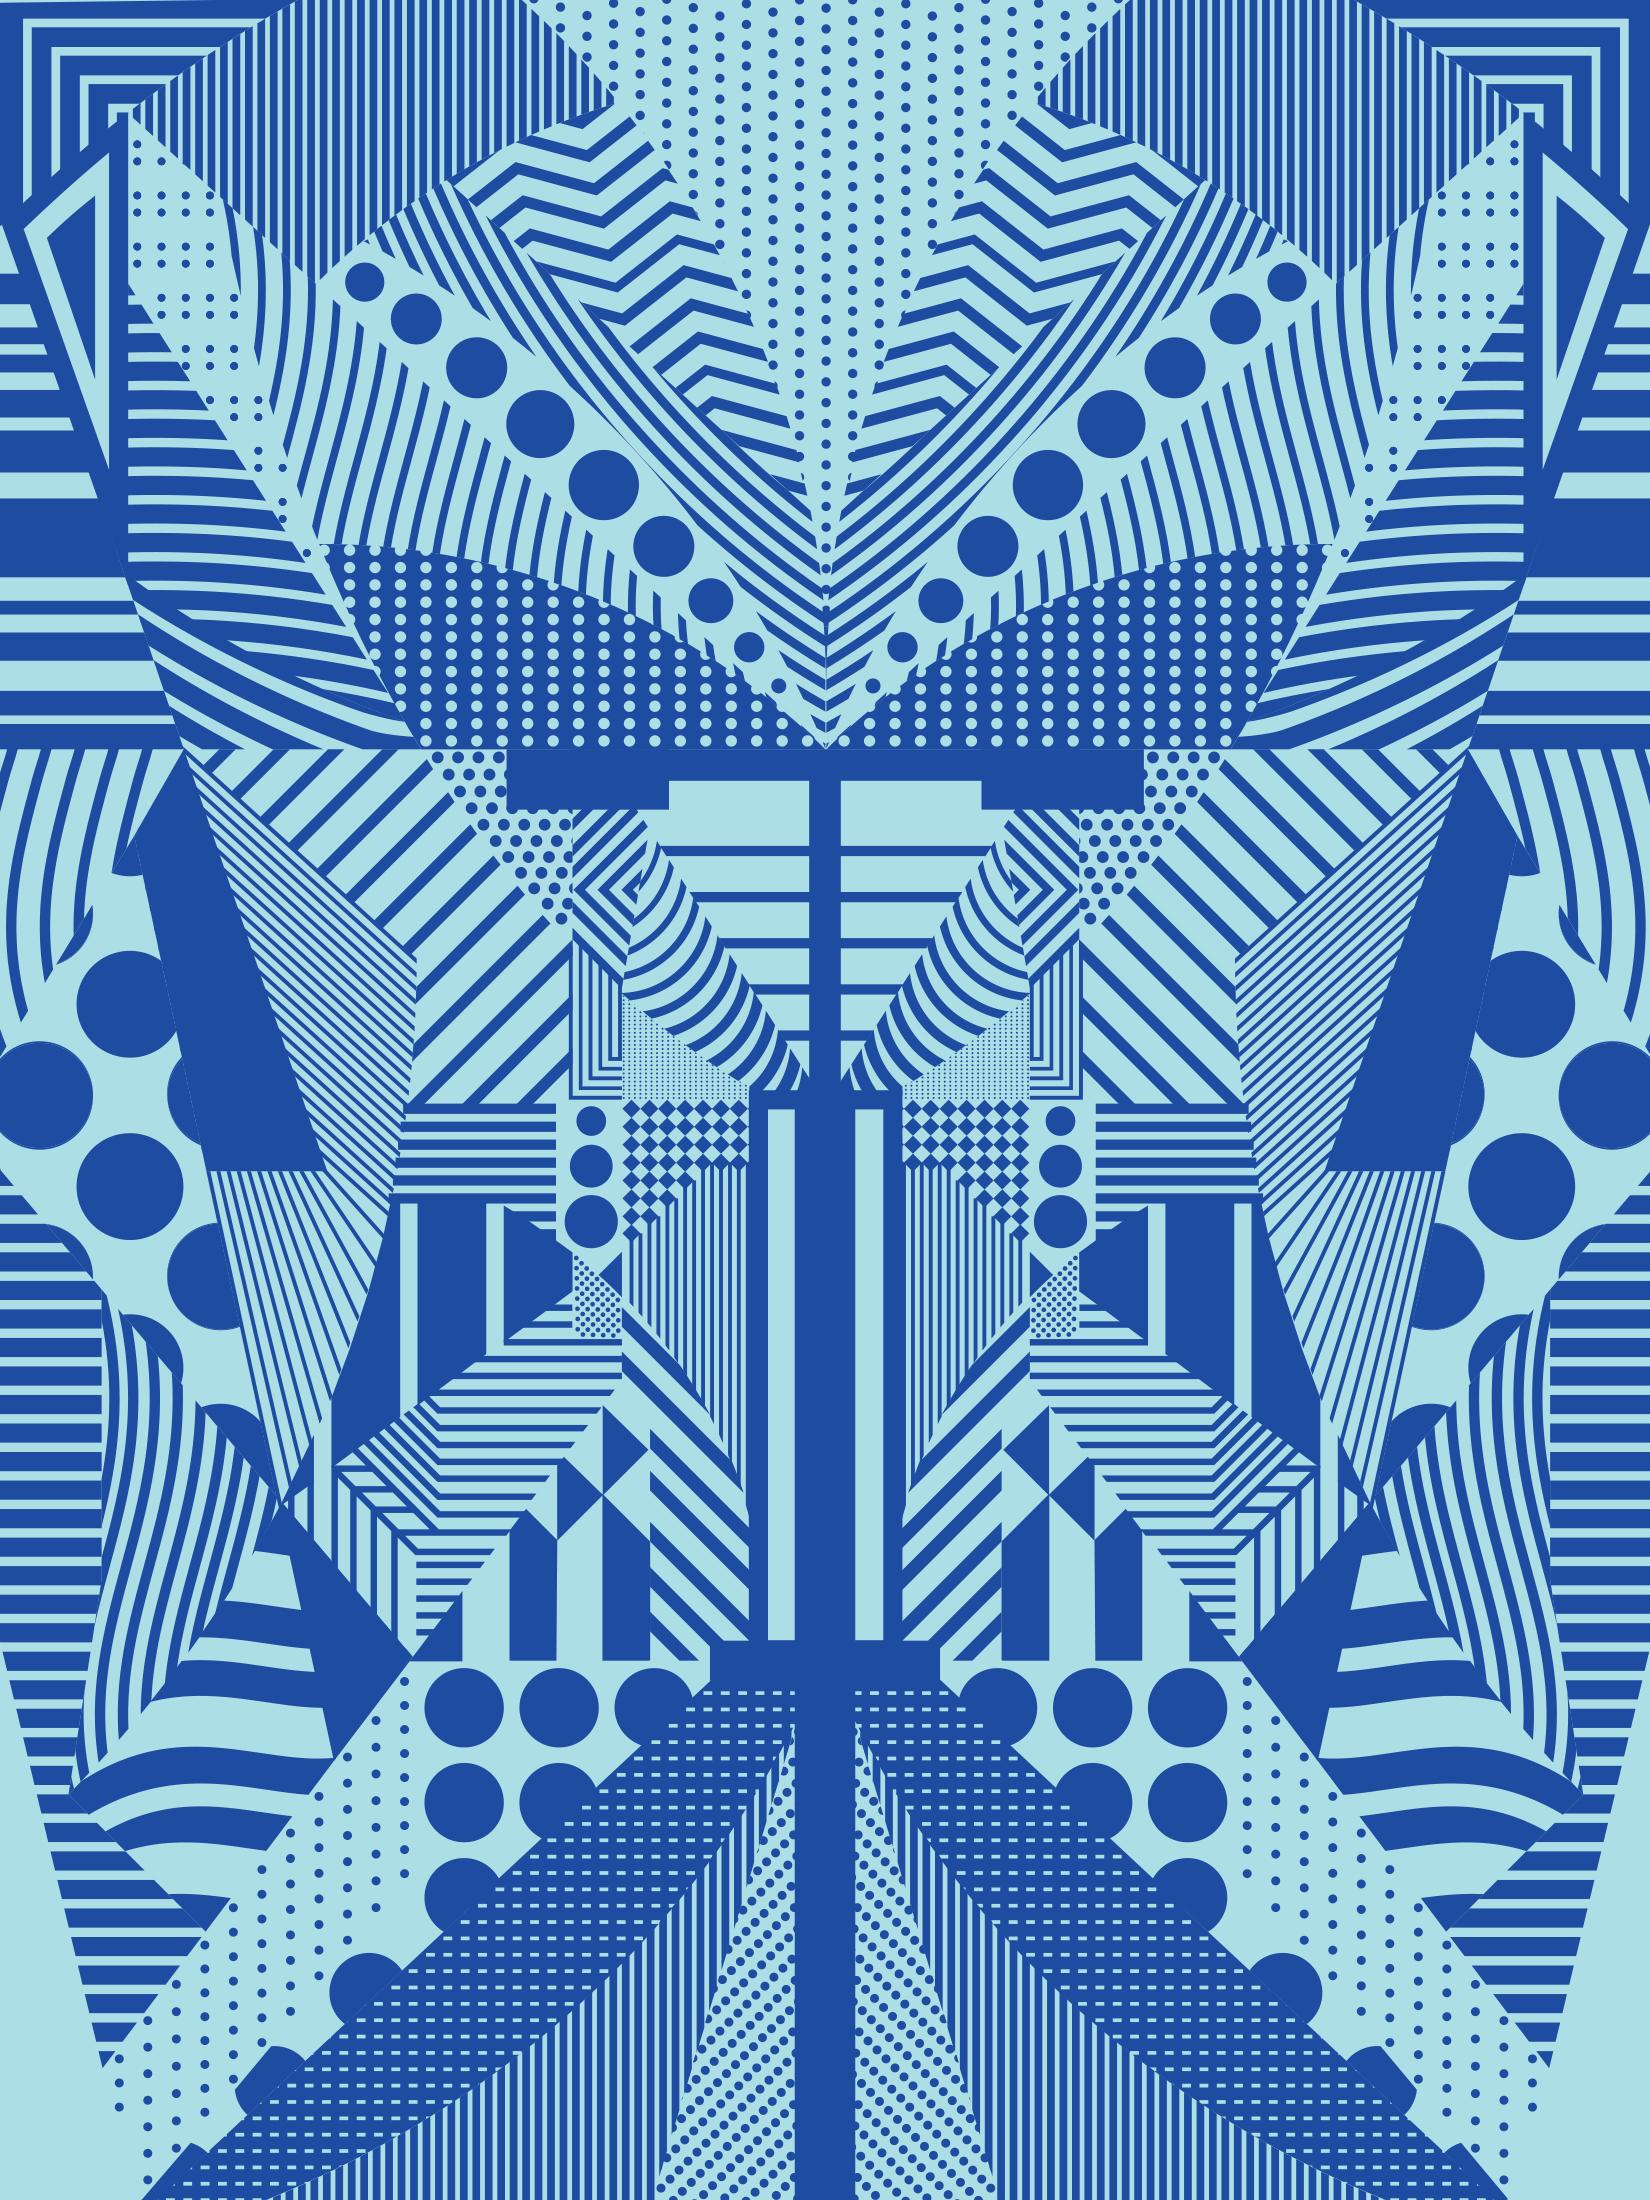 Balance, Artcrank 2014